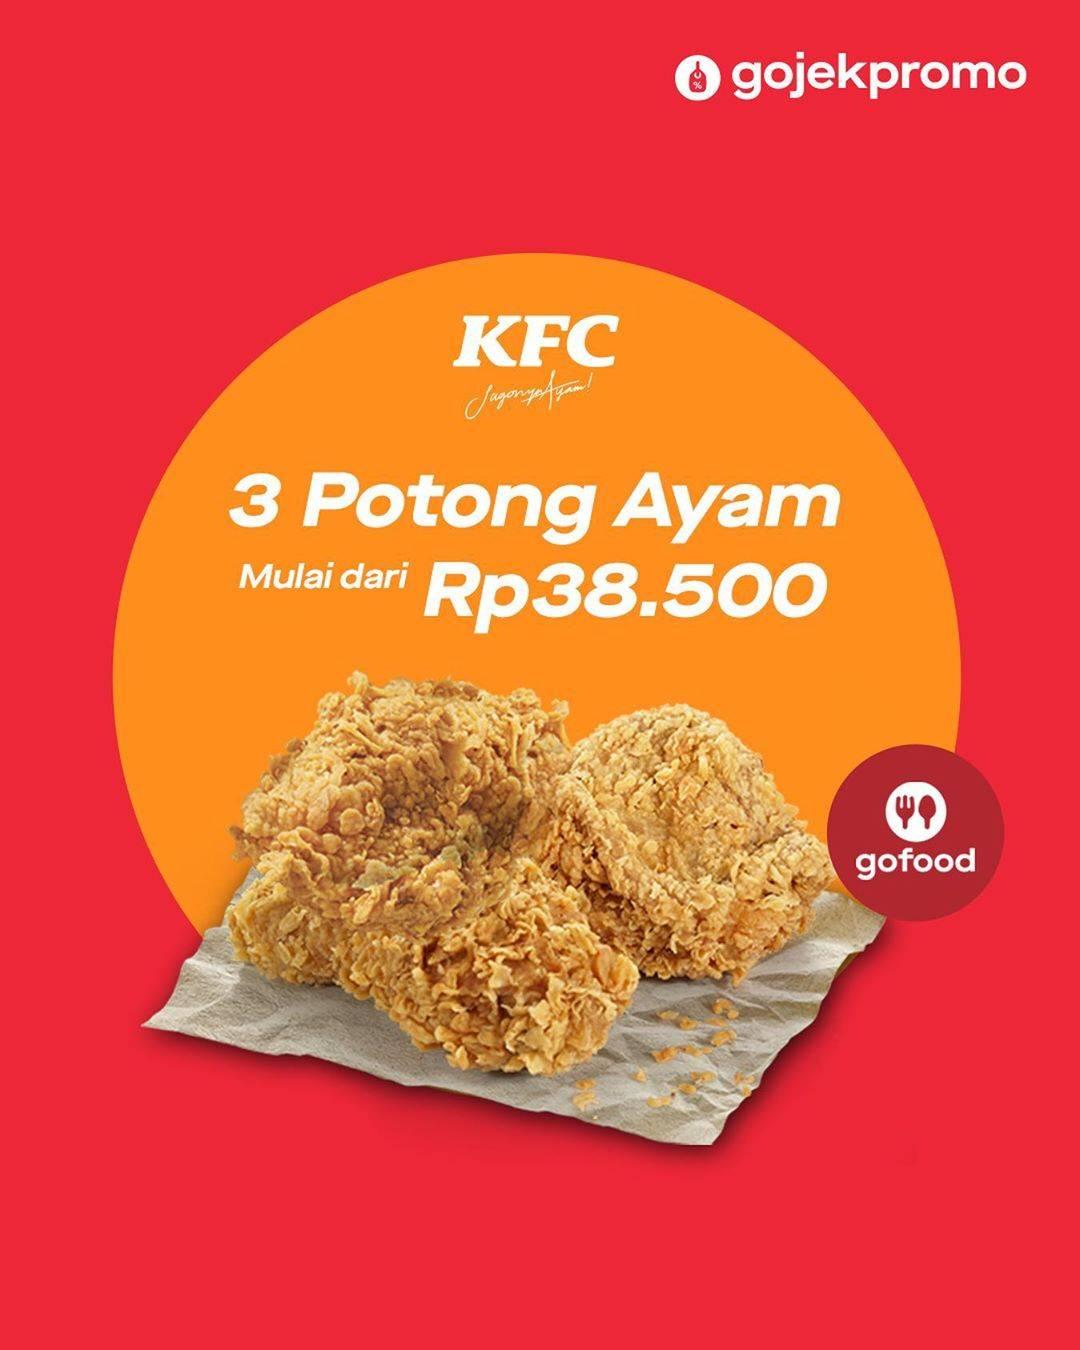 Diskon KFC Promo Beli 3 Ayam Dengan Harga Mulai Dari Rp. 38.500.